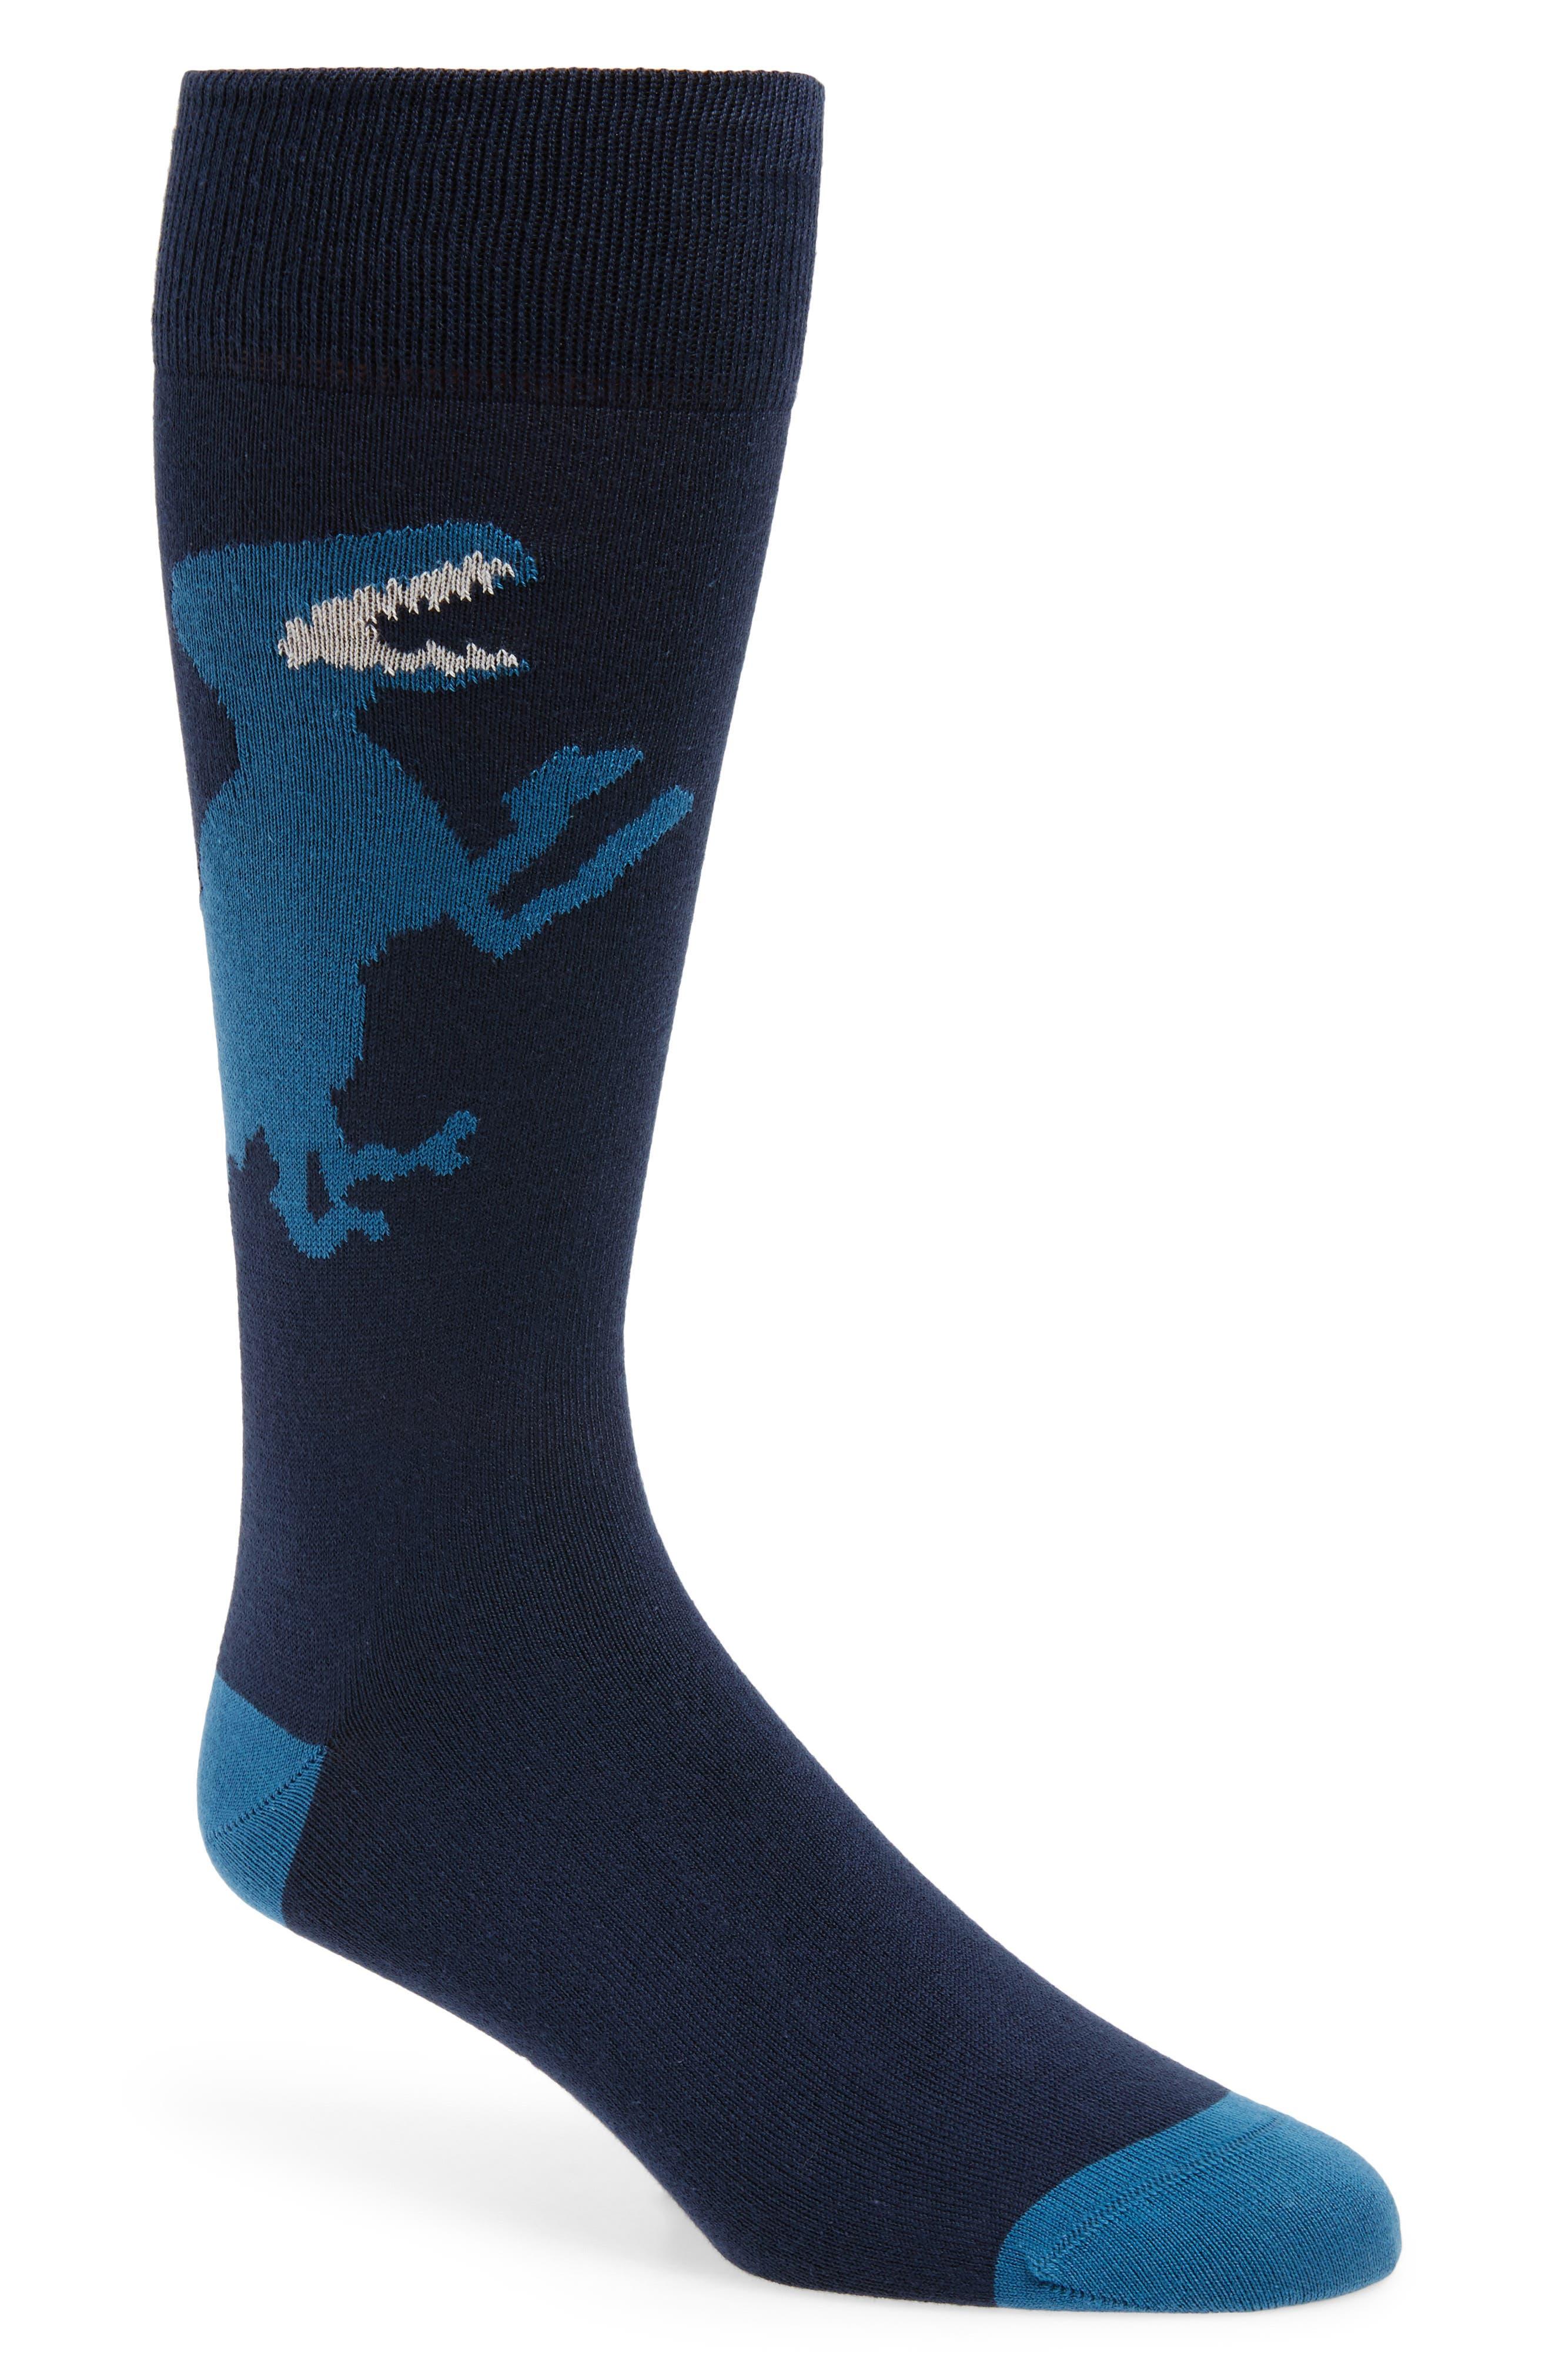 Paul Smith Big Dinosaur Socks